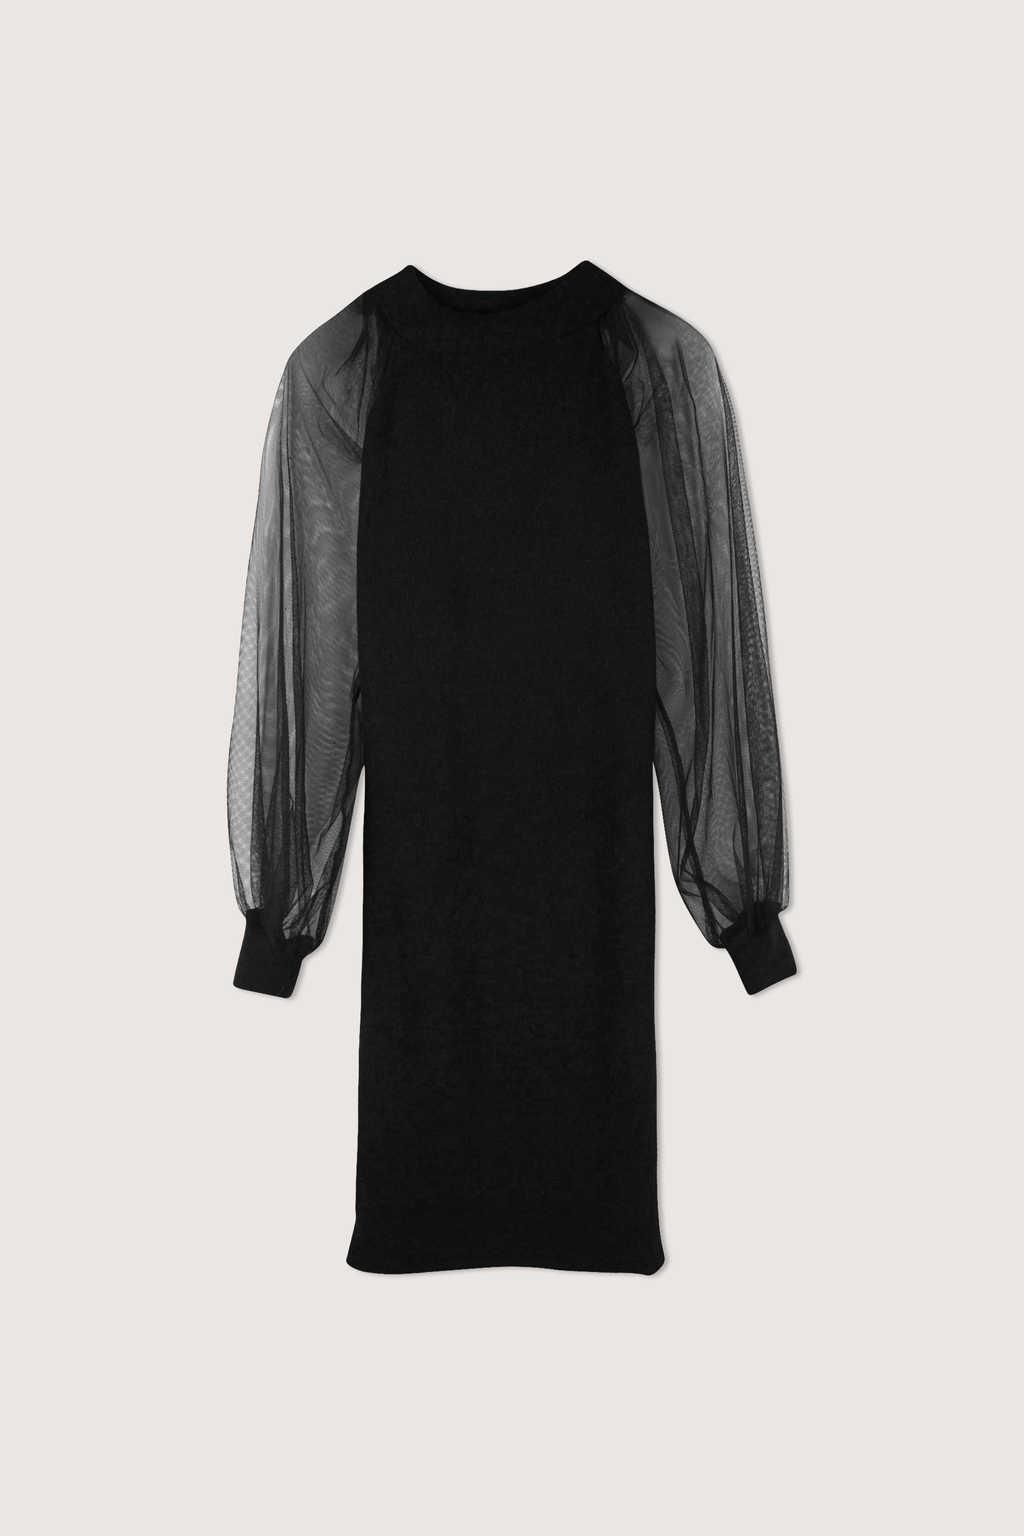 Dress H341 Black 7